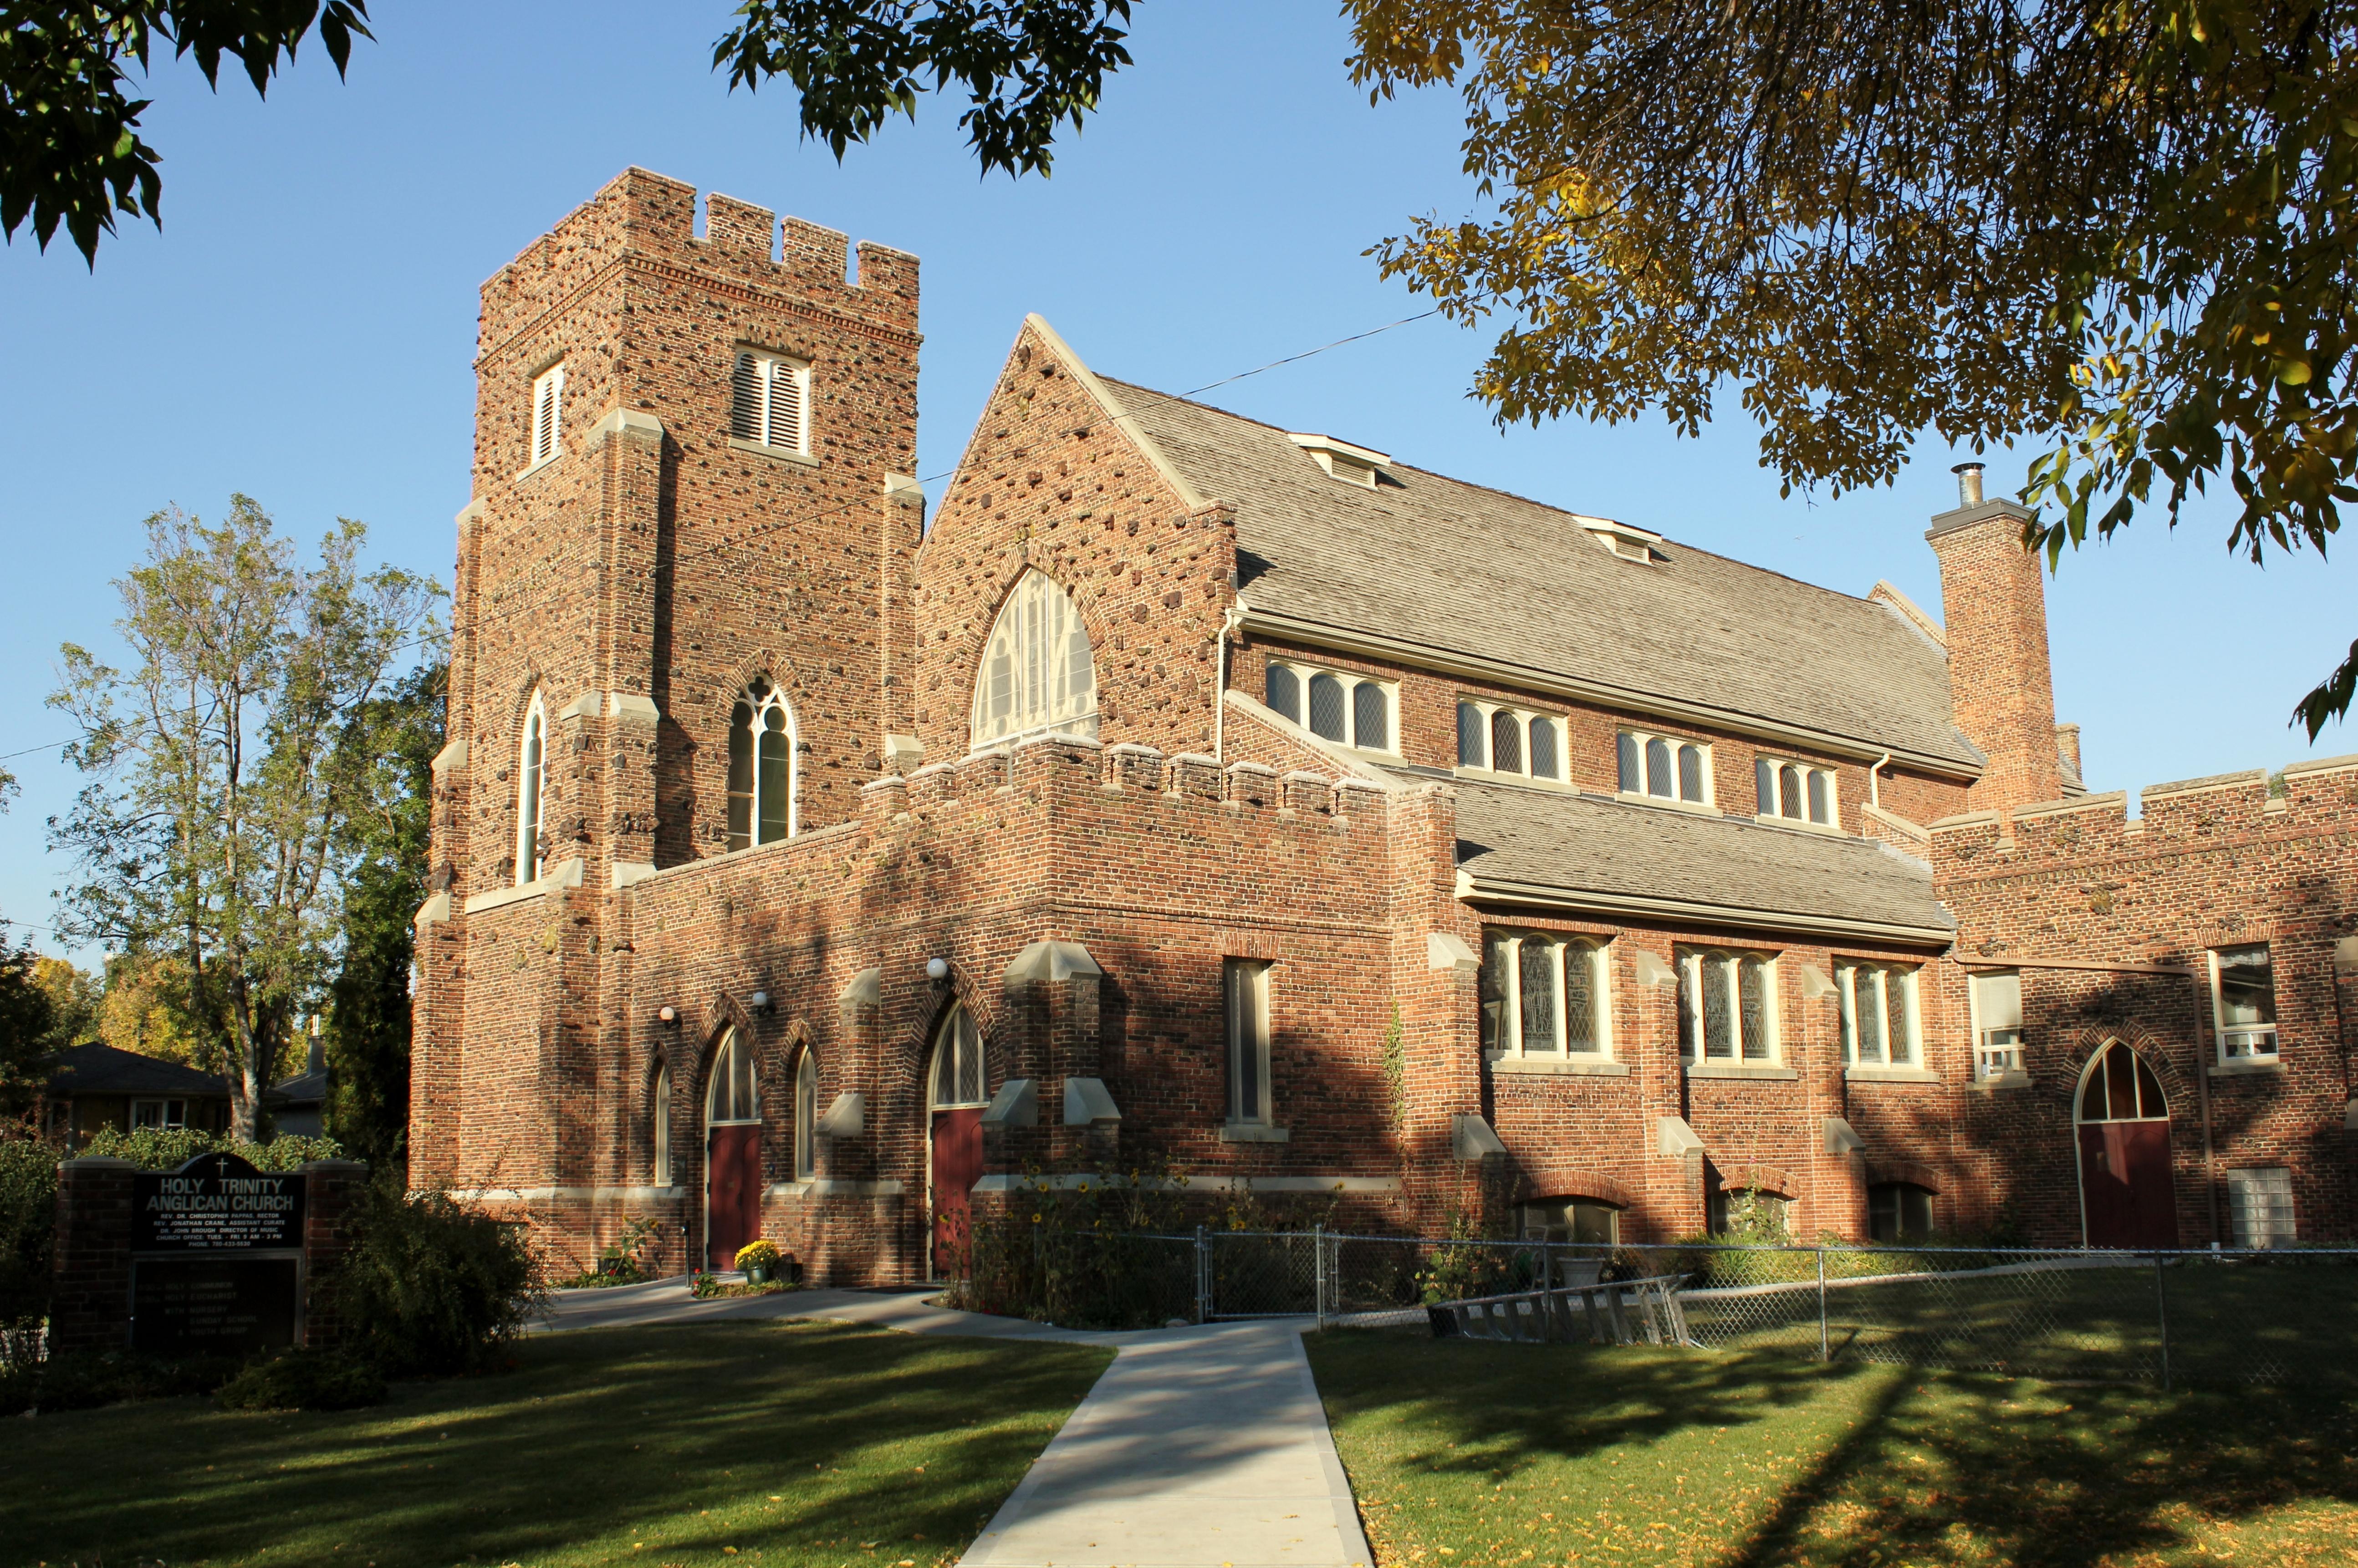 file:holy trinity anglican church, edmonton (sw corner)